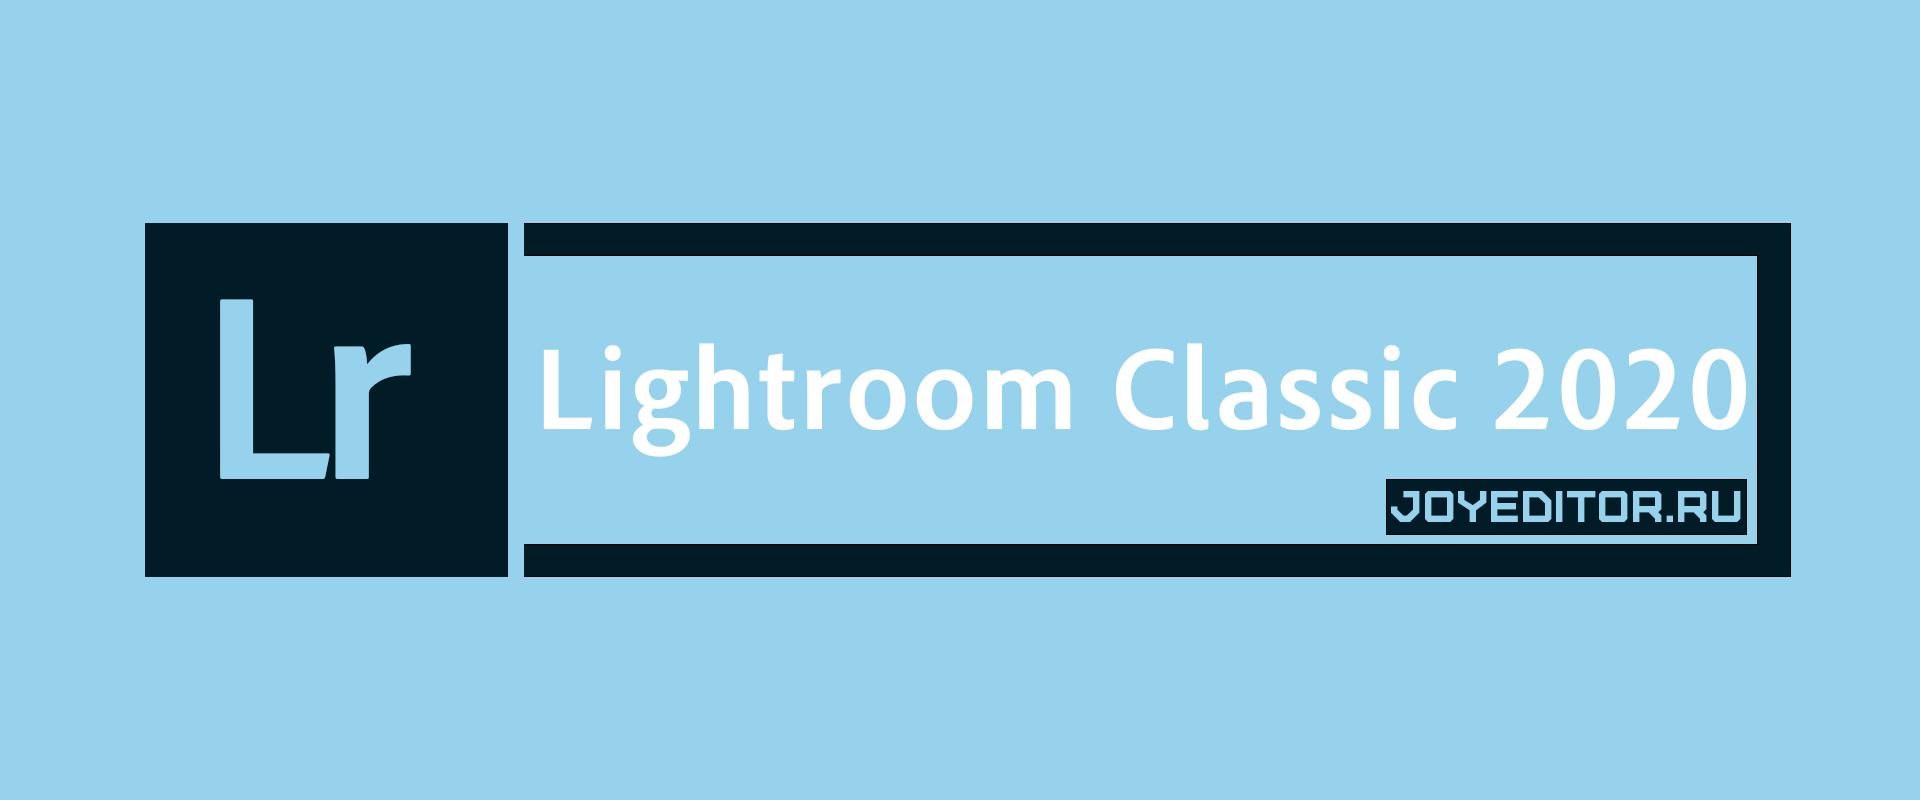 Lightroom Classic 2020